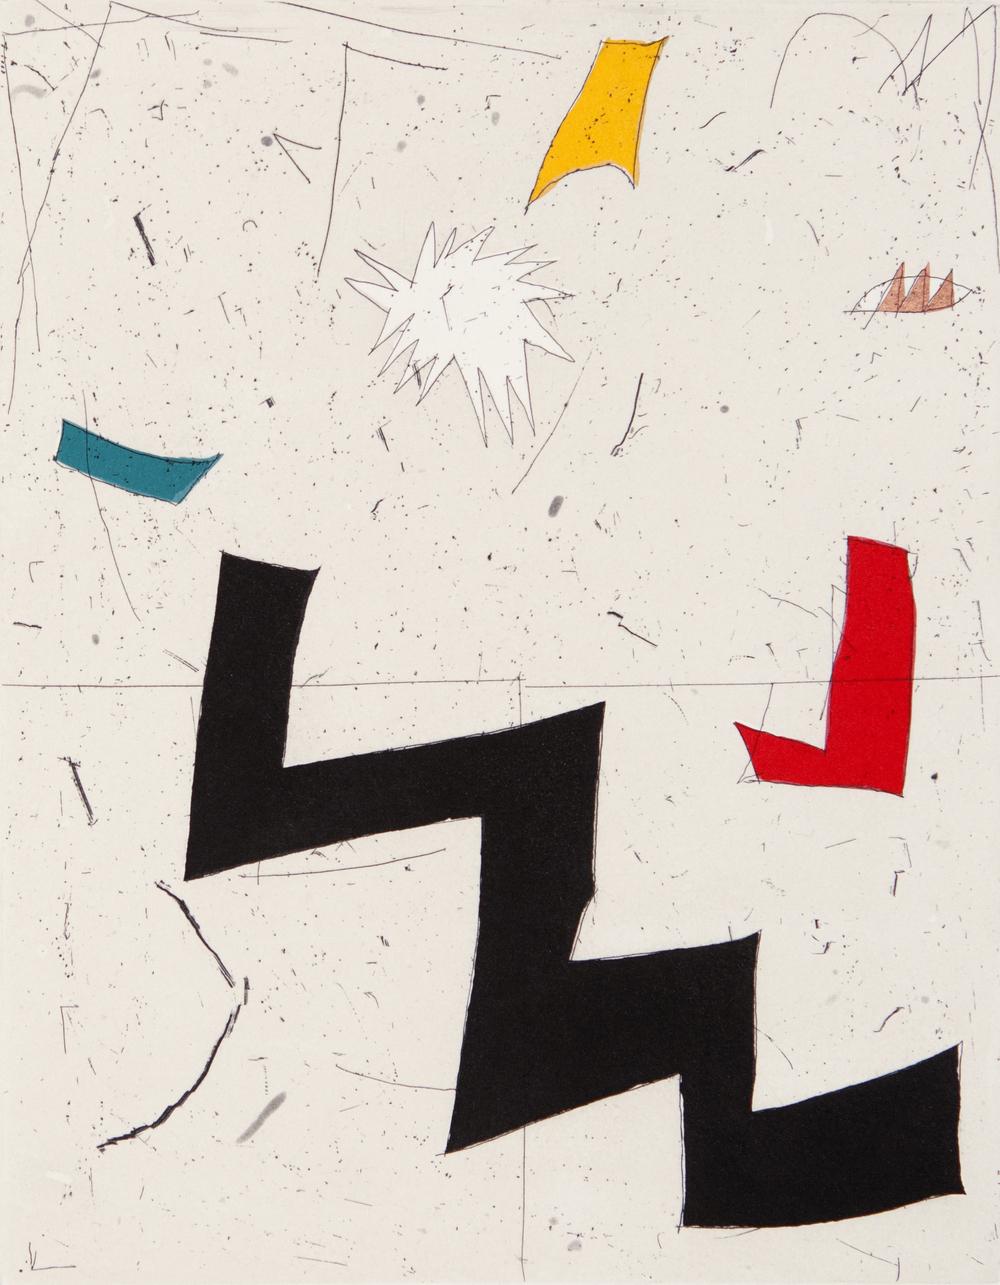 Joseph Hart Bad Math II, 2012 Color Intaglio with Chine Collé